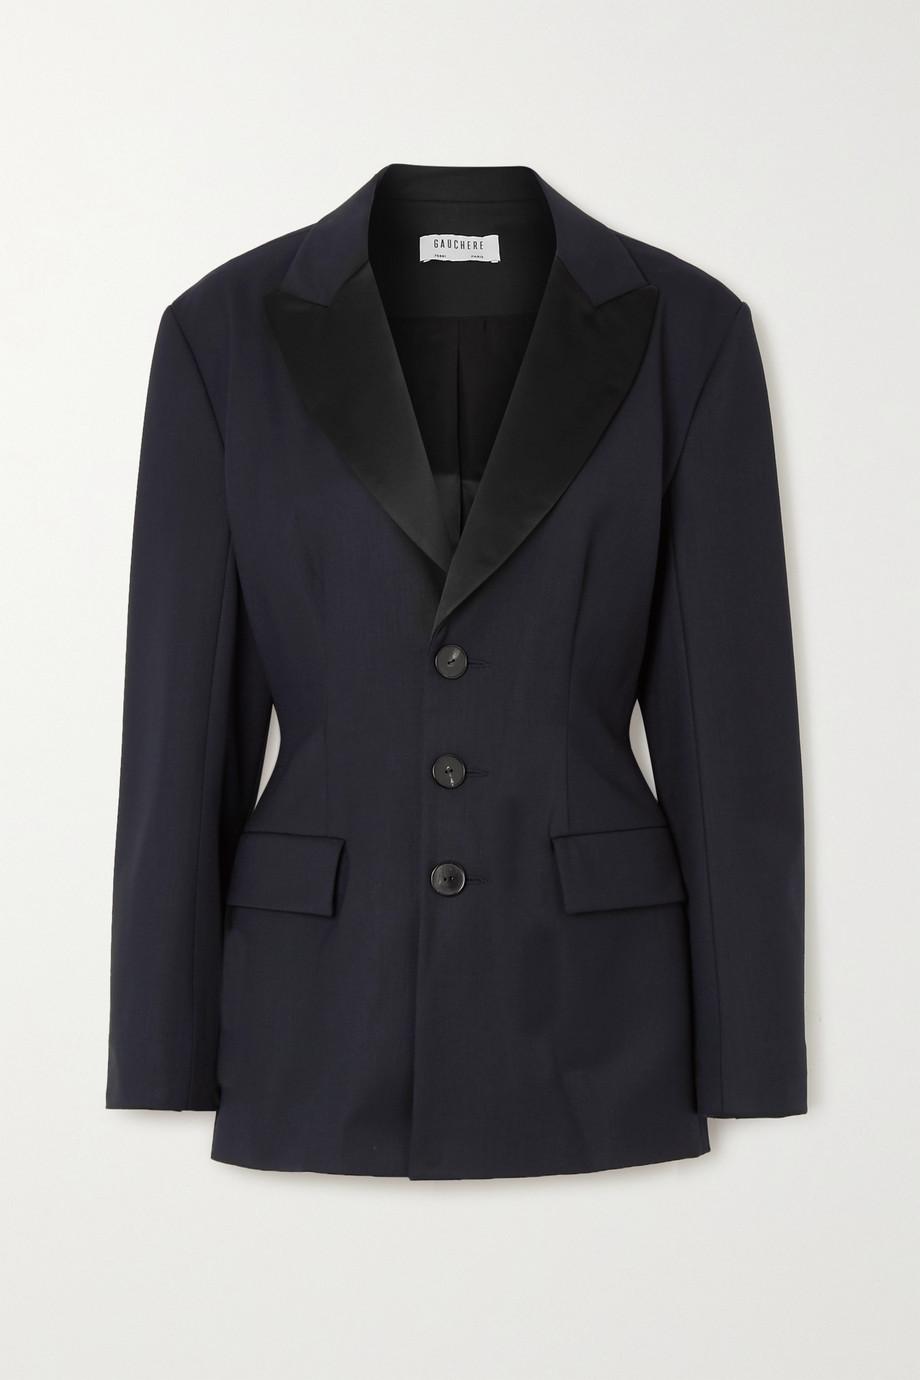 GAUCHERE Rachel satin-trimmed wool-blend gabardine blazer